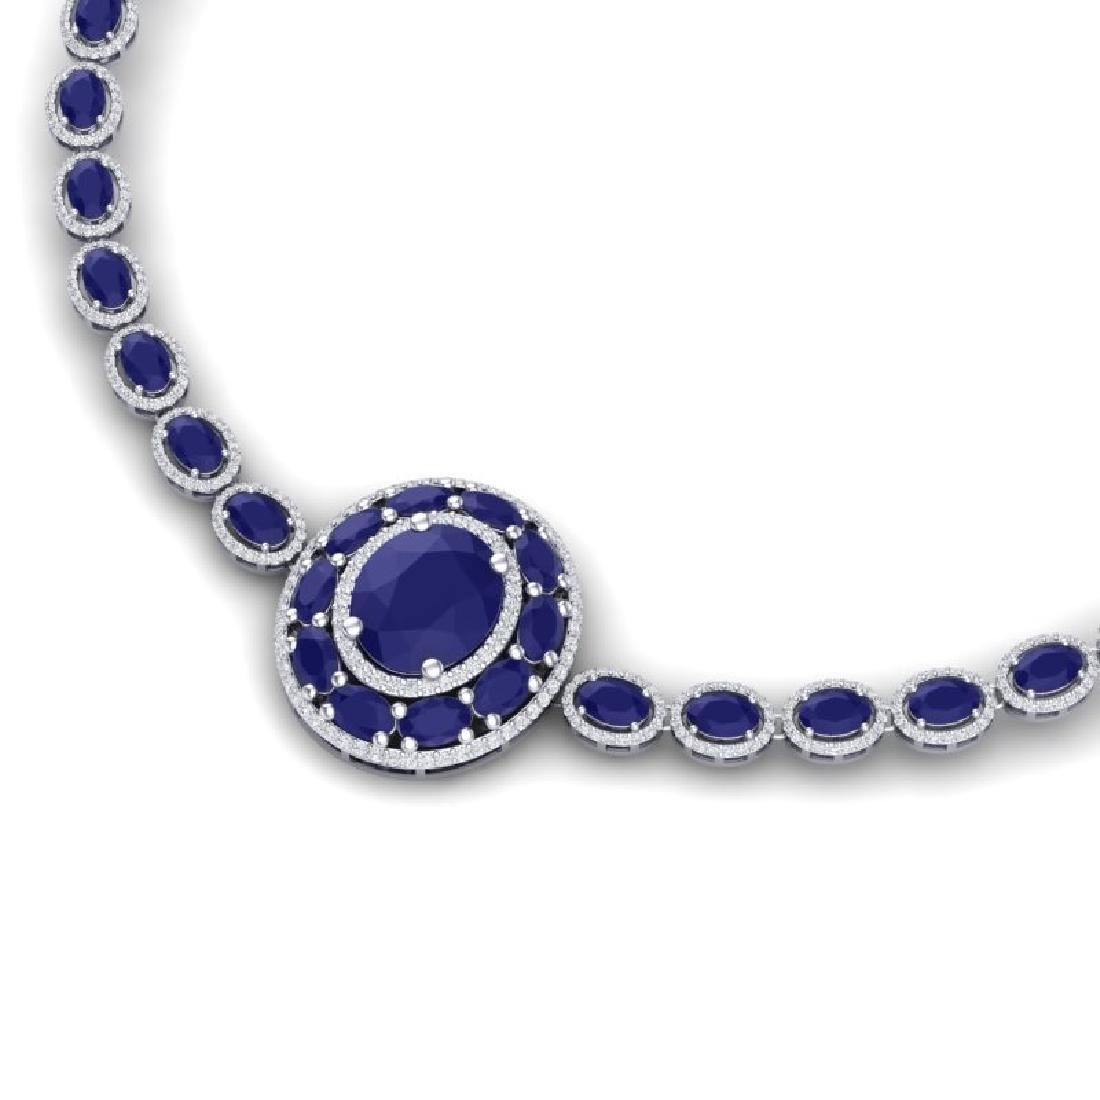 43.54 CTW Royalty Sapphire & VS Diamond Necklace 18K